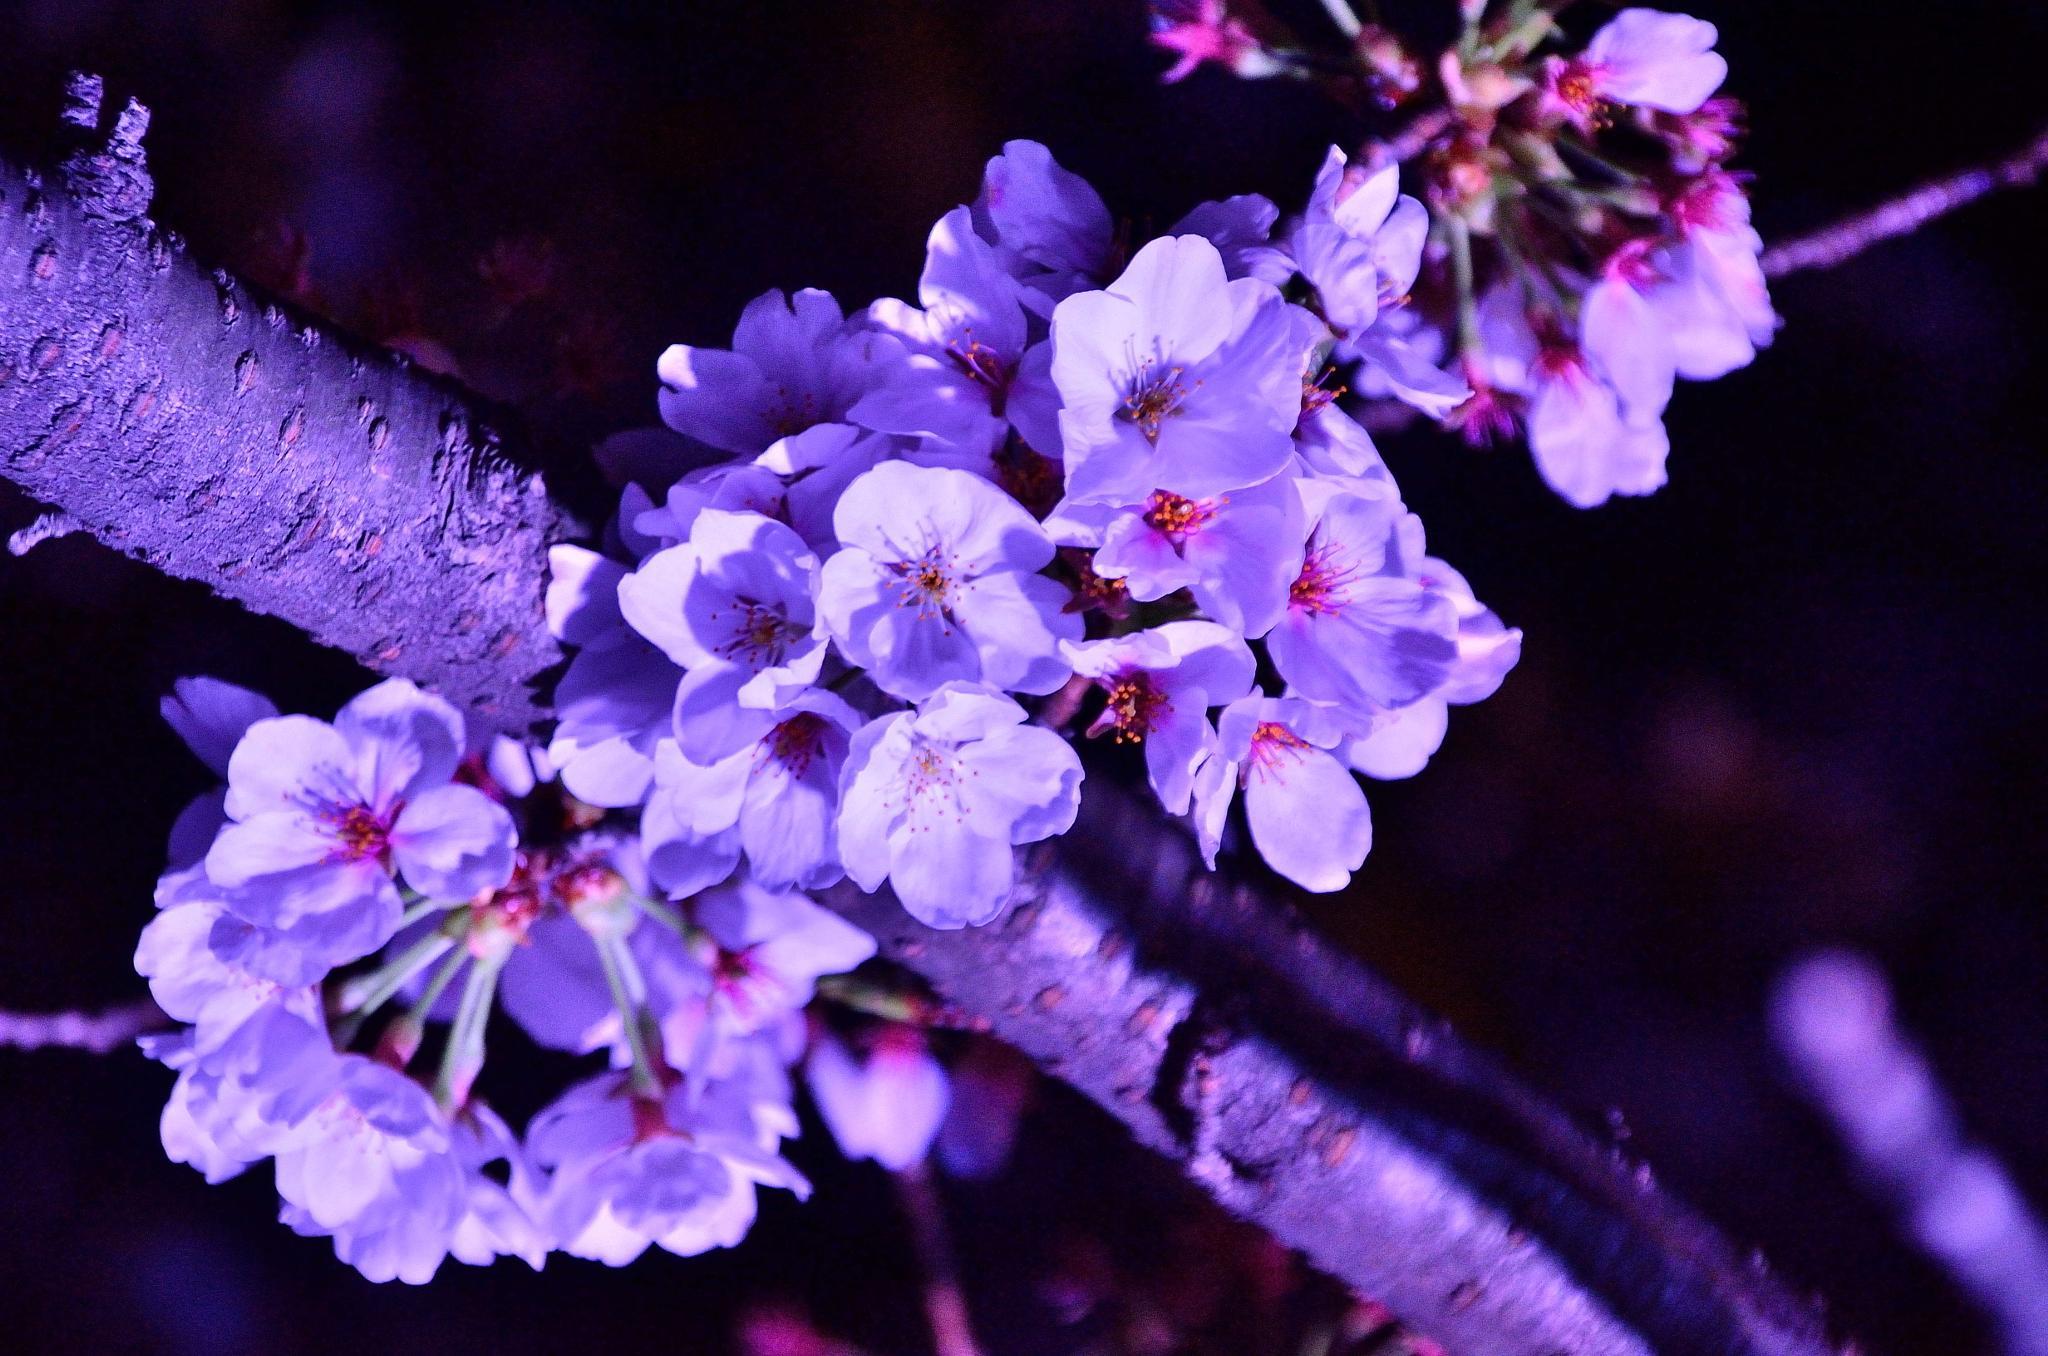 under blue light by Hiroaki Hattori